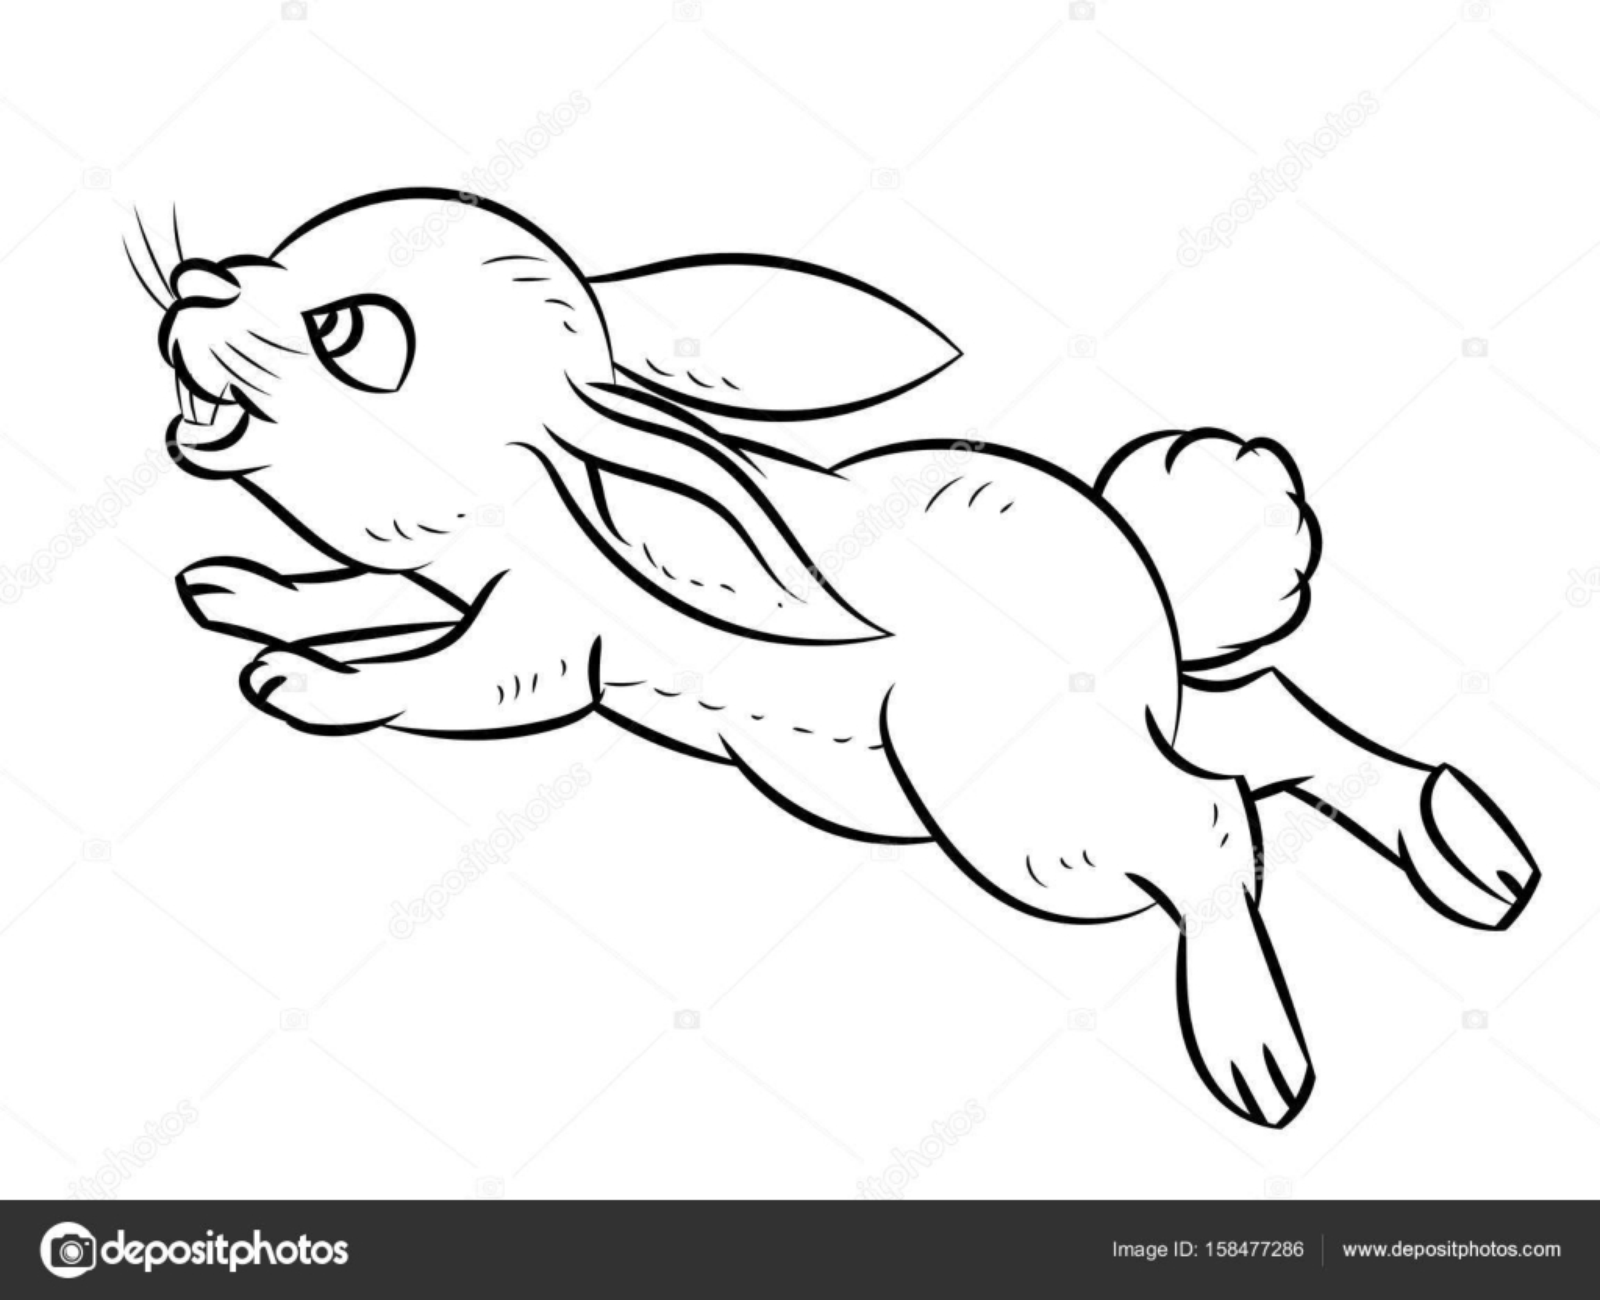 Dessin au trait de lapin ligne simple vecteur image for Lepre immagini da stampare